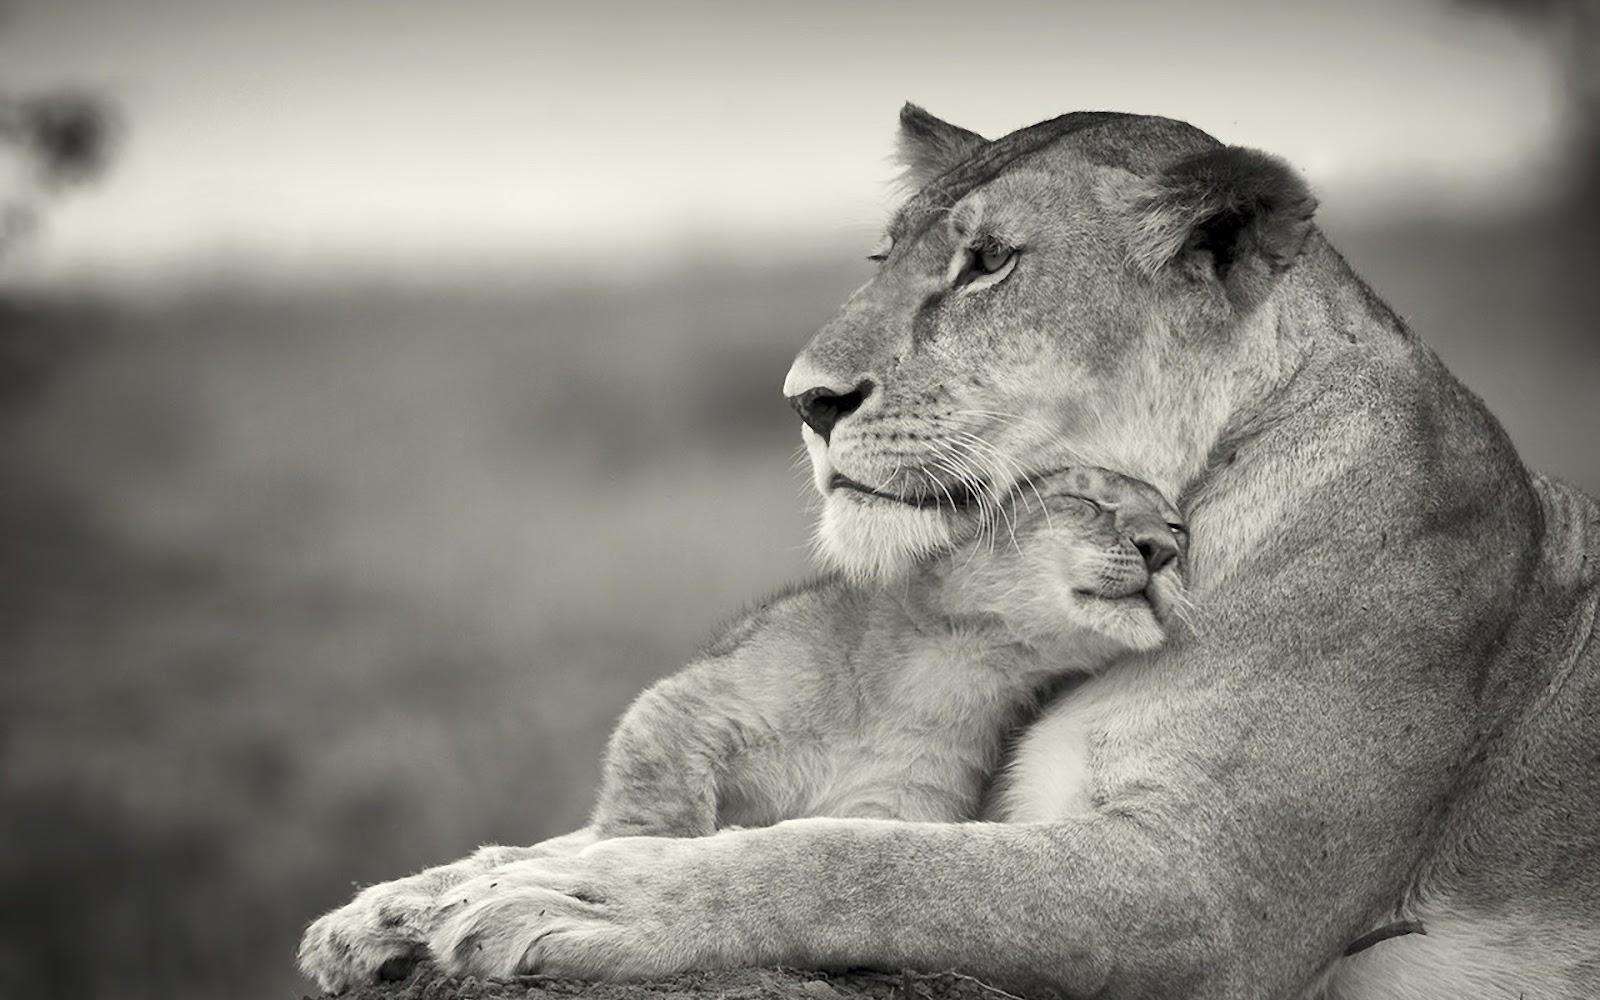 <b>Baby</b> Olifant Behang-Koop Goedkope <b>Baby</b> Olifant Behang loten van ...